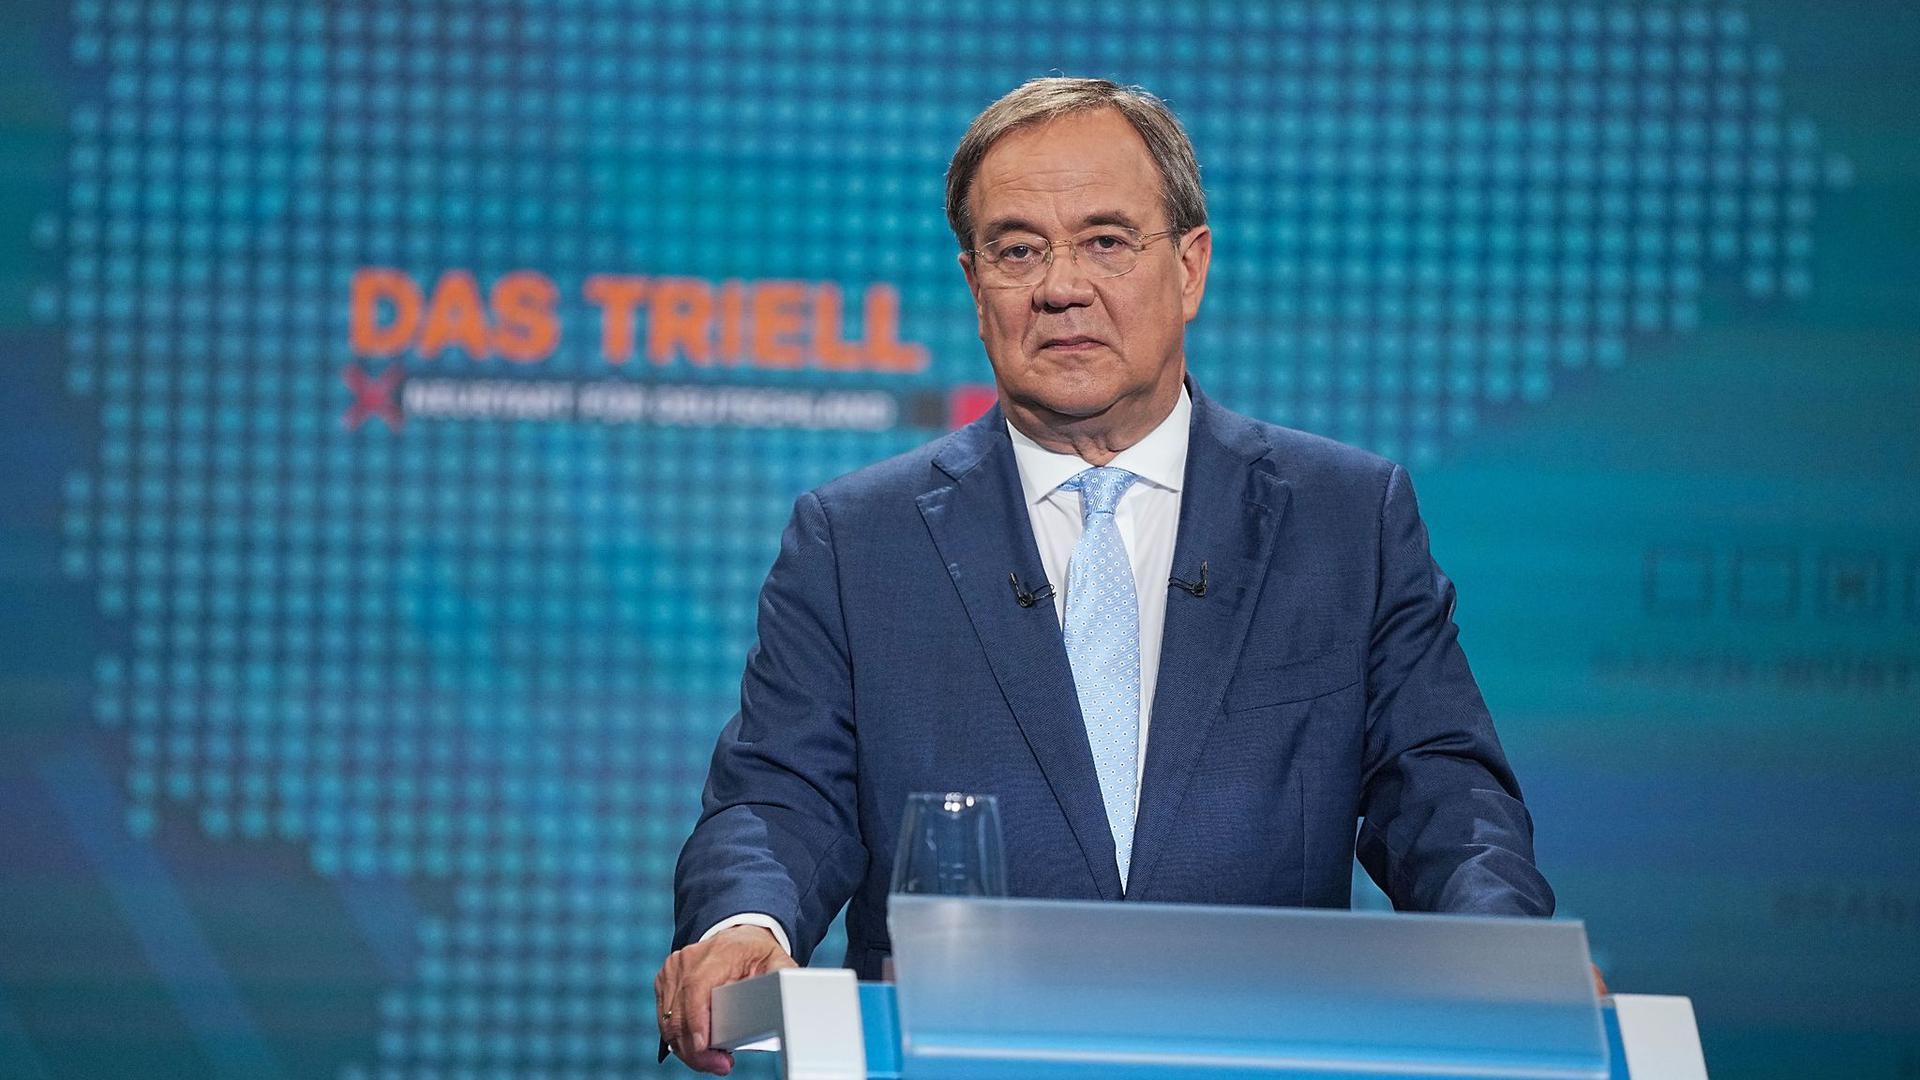 Unions-Kanzlerkandidat Armin Laschet (CDU) beim ersten TV-Triell.